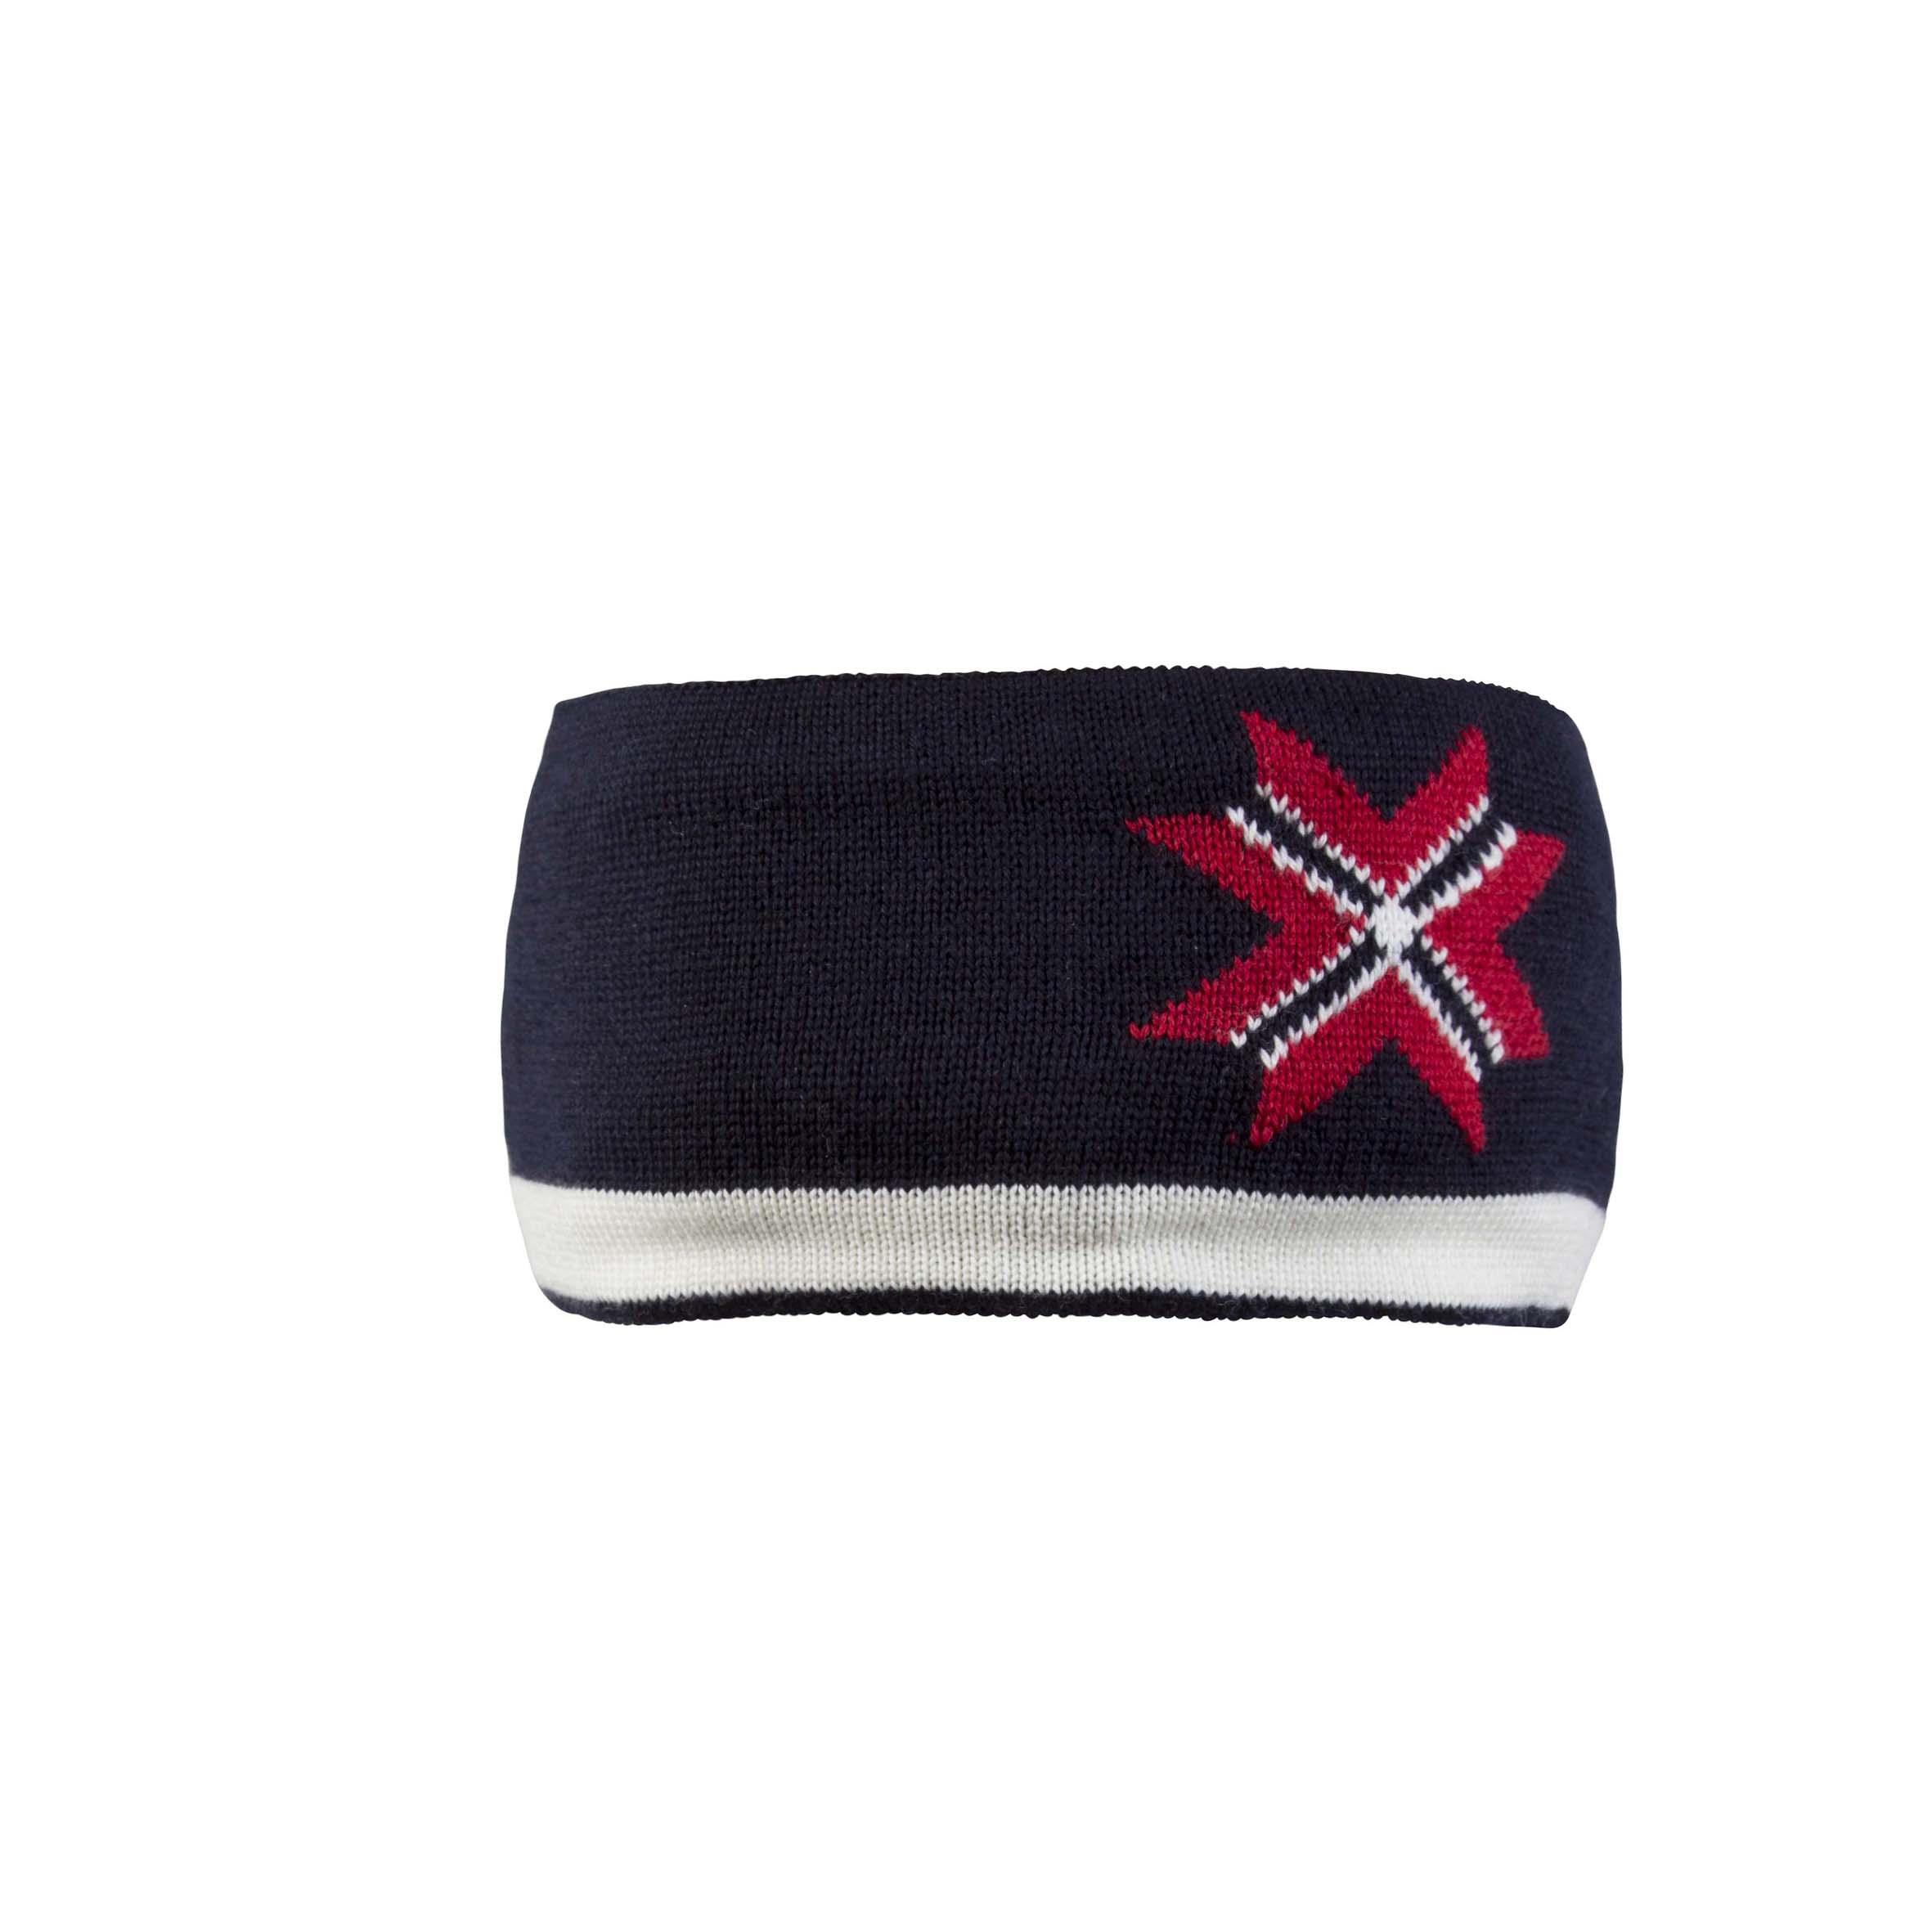 OL Passion Headband (1)